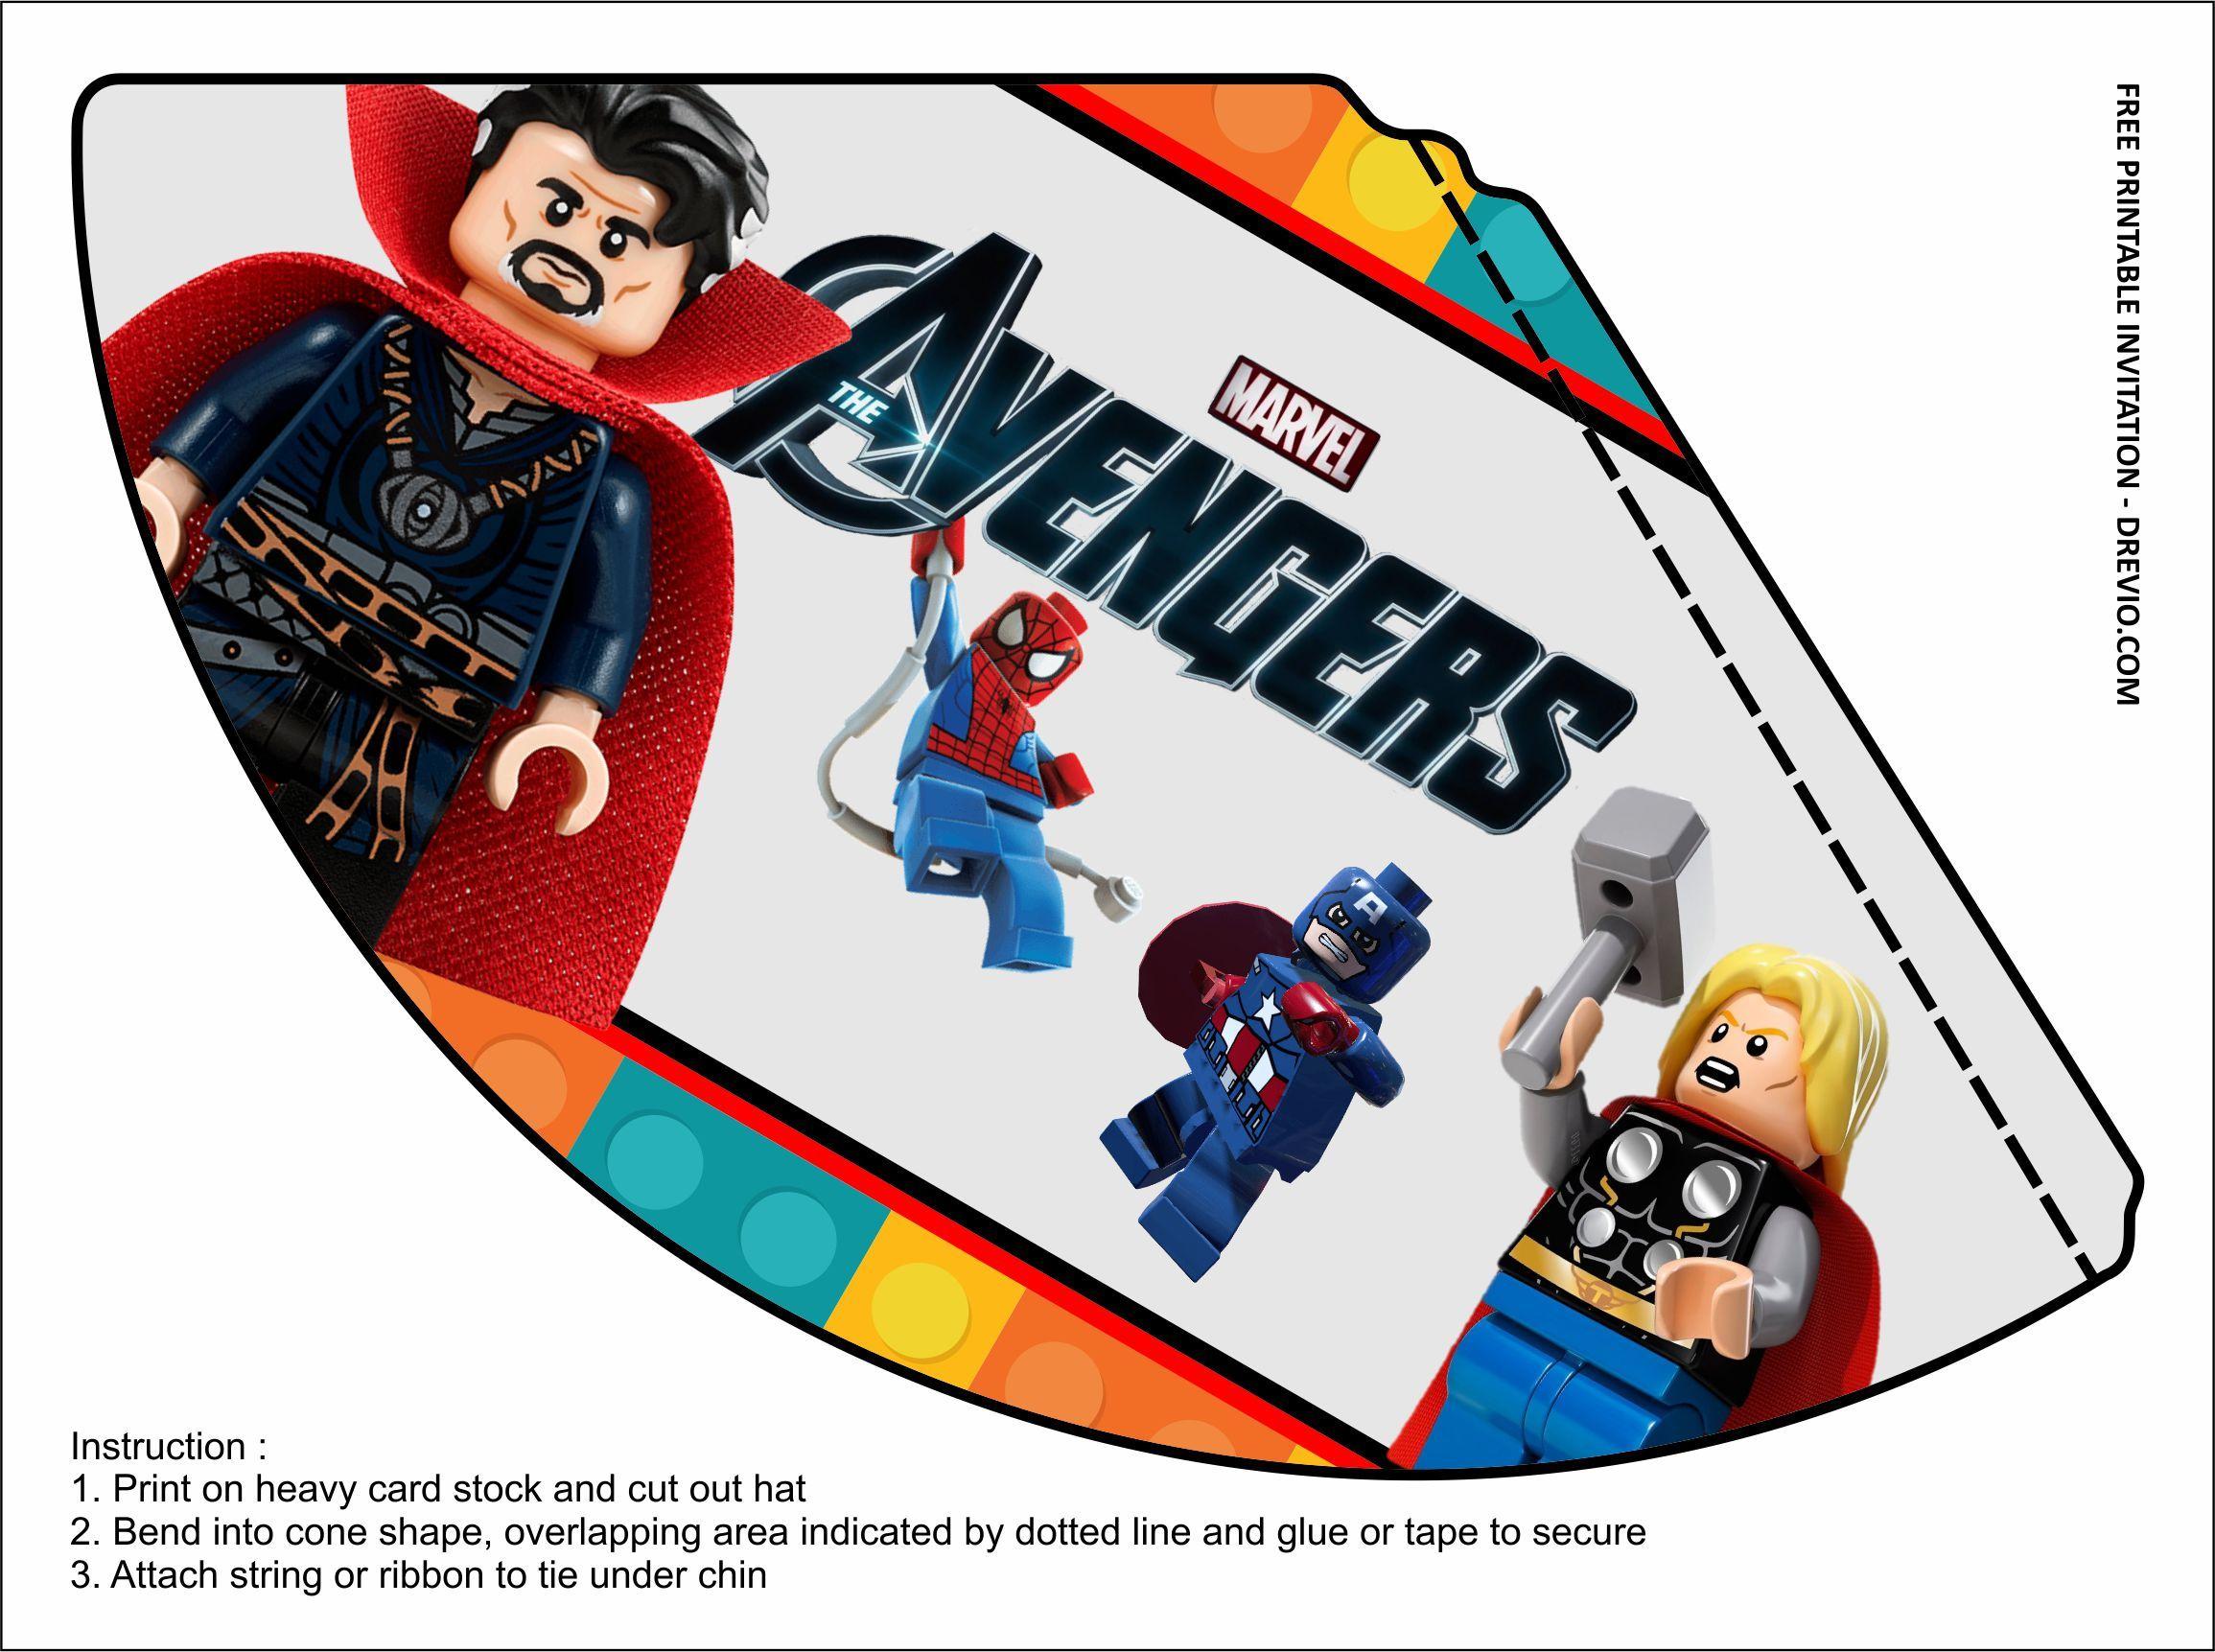 Free Printable Lego Avengers Birthday Kits Templates Avengers Birthday Free Printable Birthday Invitations Printable Birthday Invitations